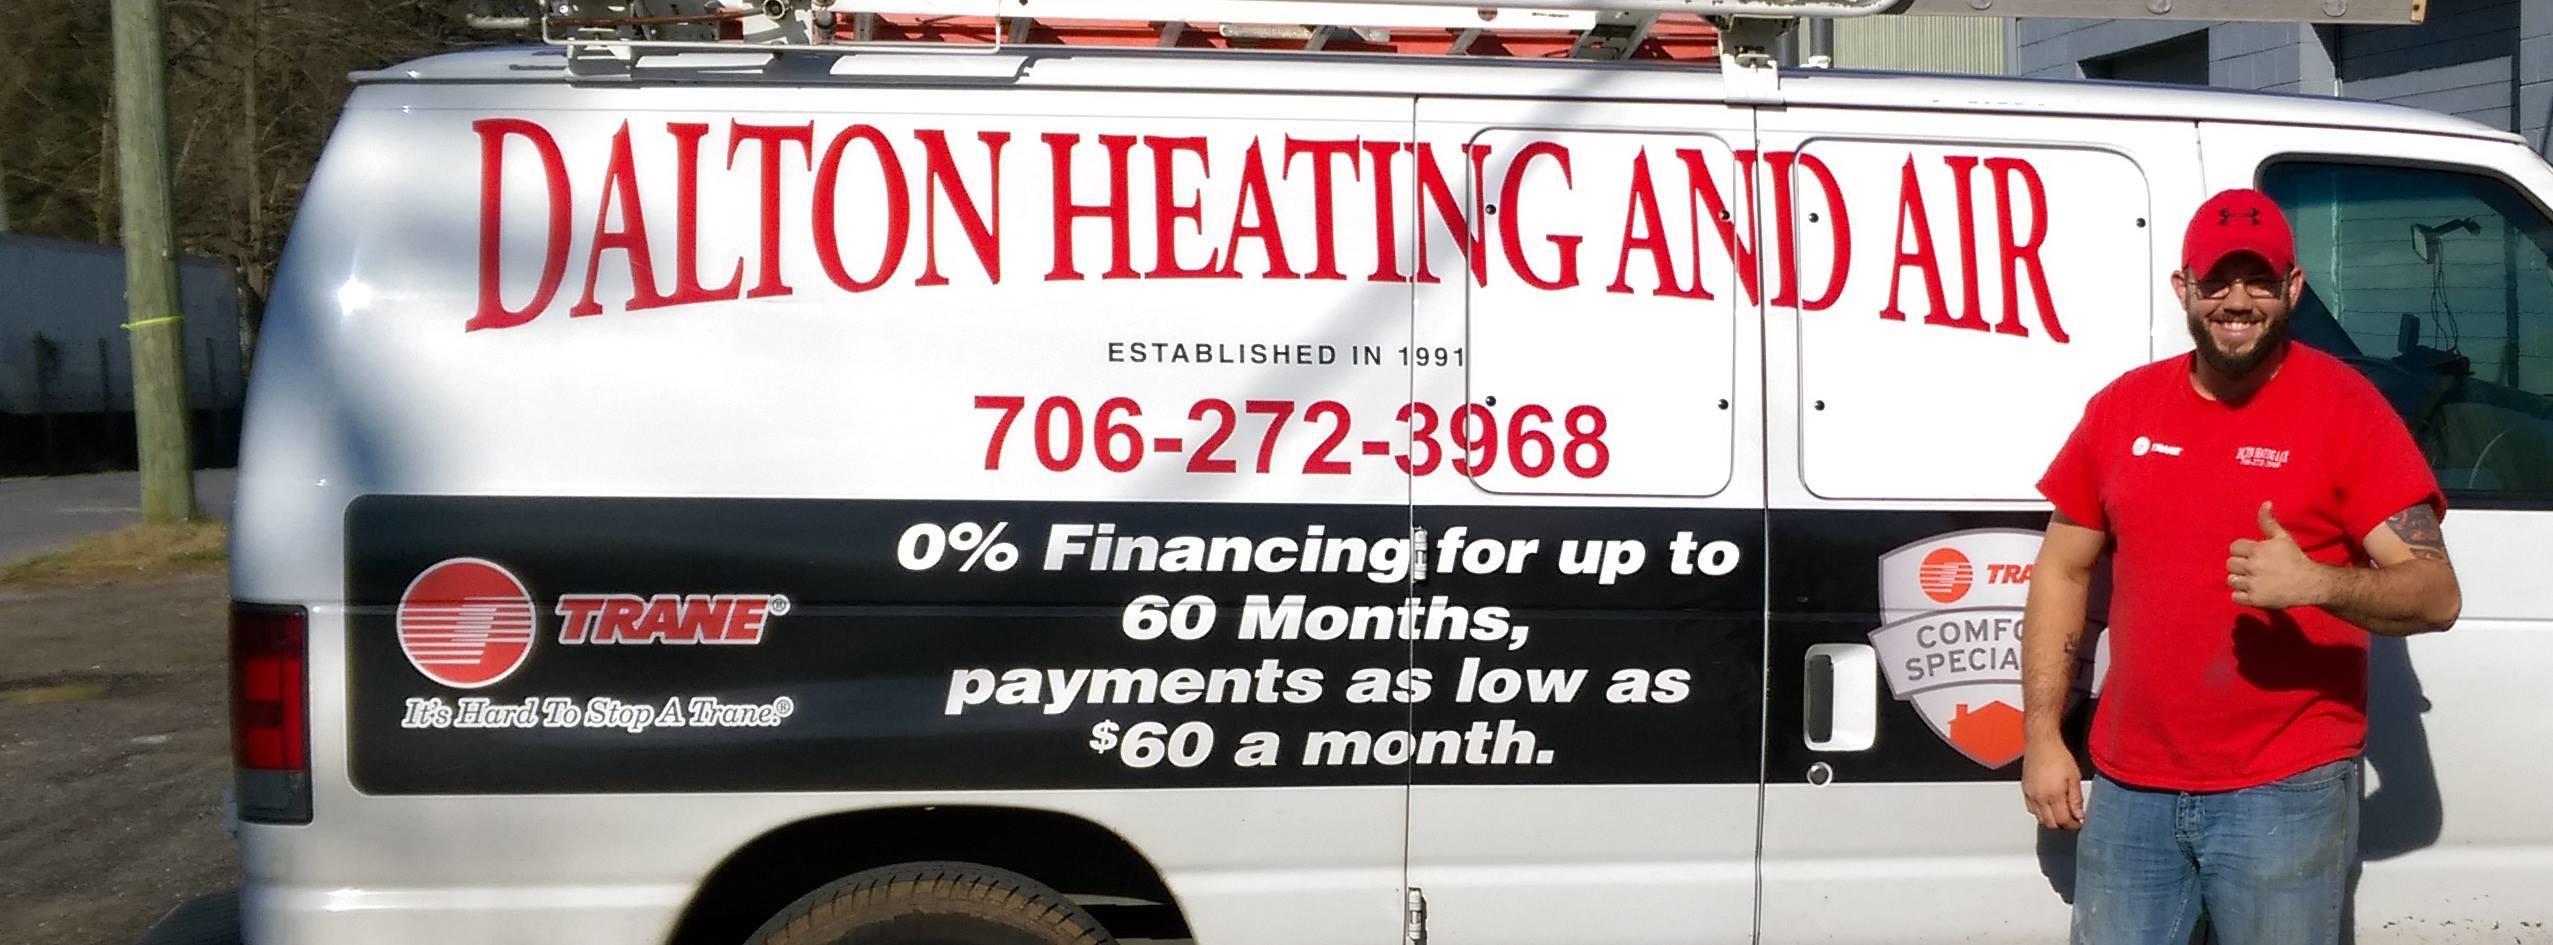 Dalton Heating & Air image 4